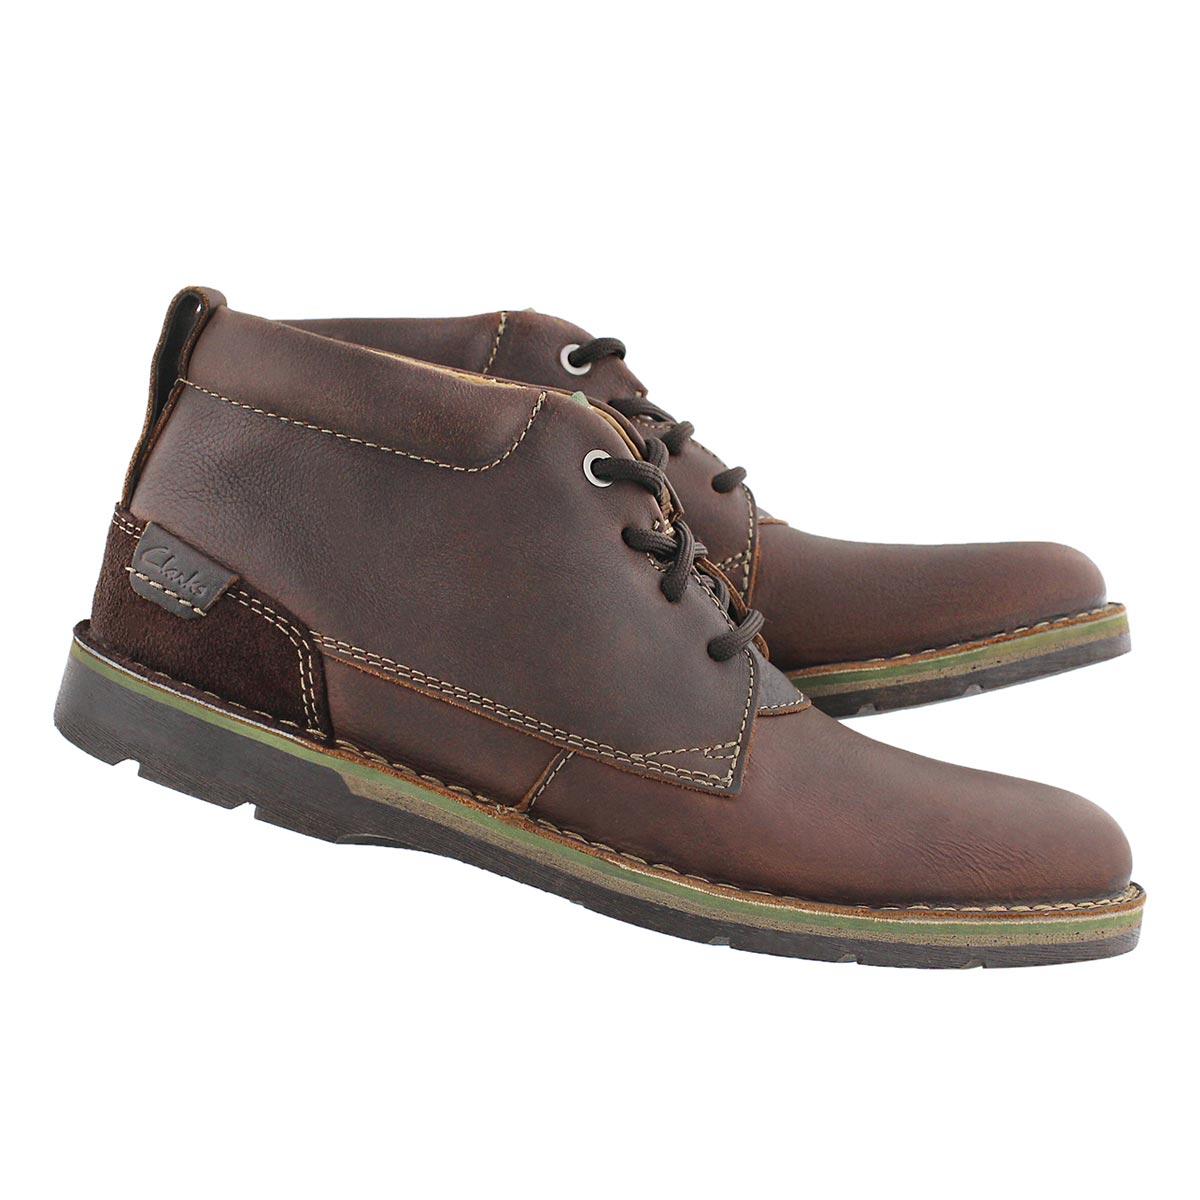 Mns Edgewick Mid brn chukka boot